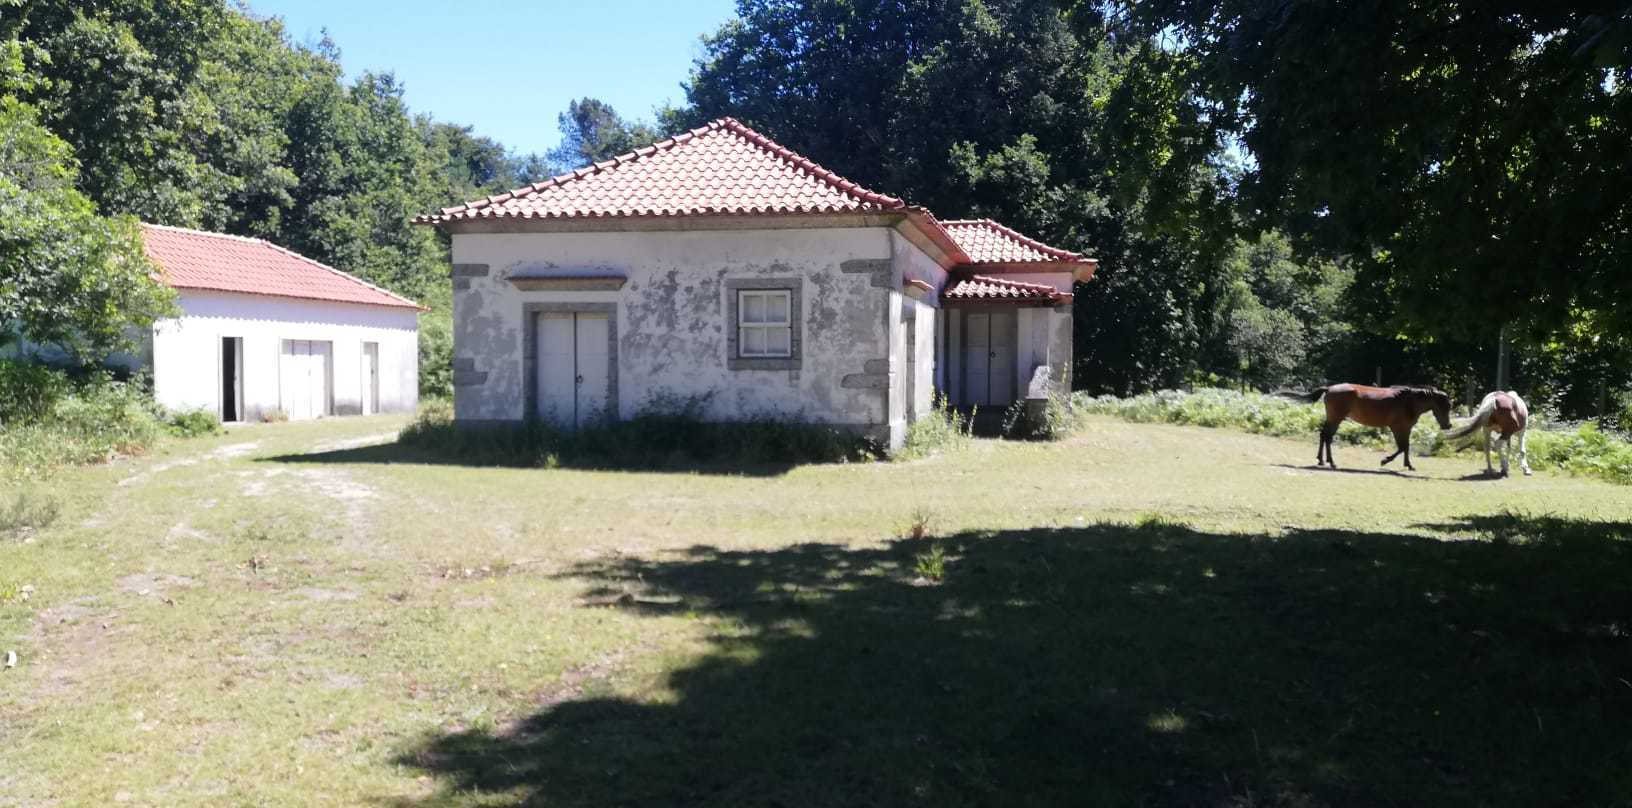 Casa da Guarda Sta Marta de Bouro